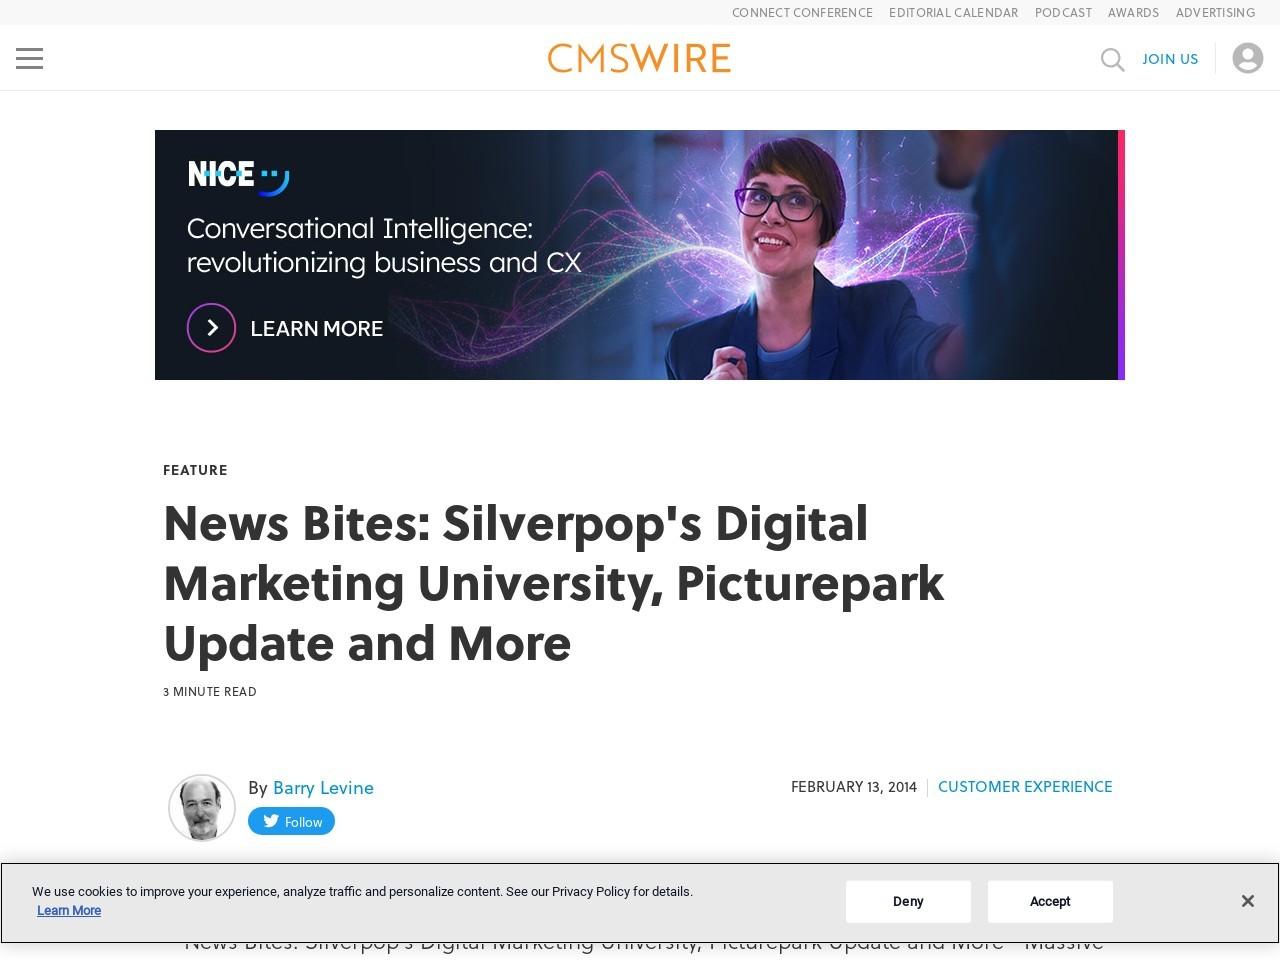 News Bites: Silverpop's Digital Marketing University, Picturepark Update and More